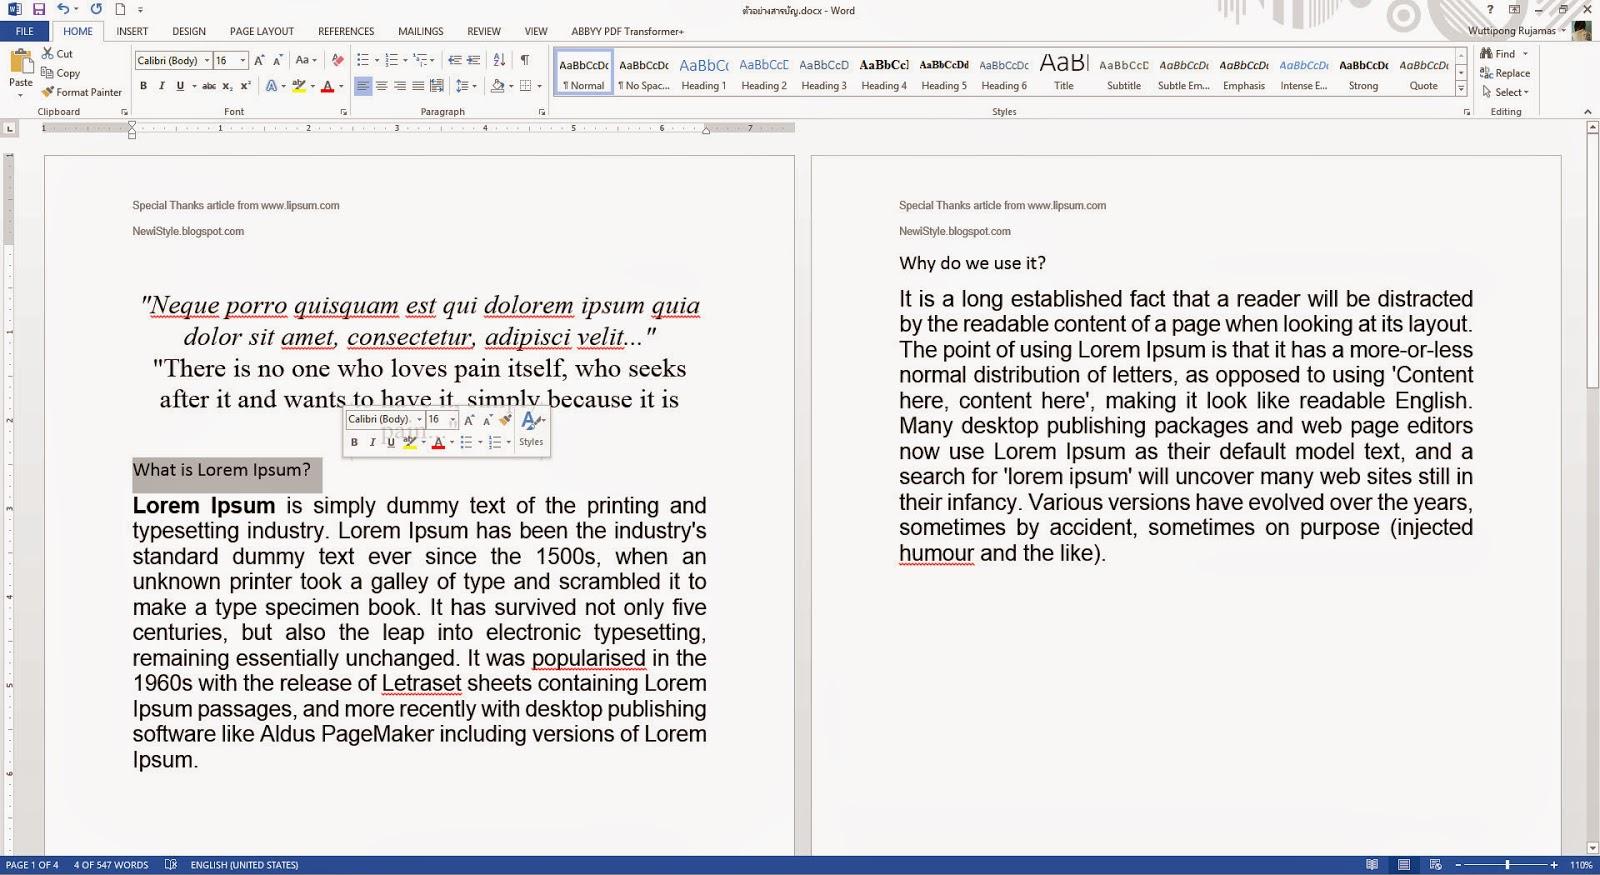 Microsoft Office Word - ทำการคลุมดำหัวข้อของเรากัน เพื่ออะไรน่ะหรอ ดูรูปต่อไปสิ